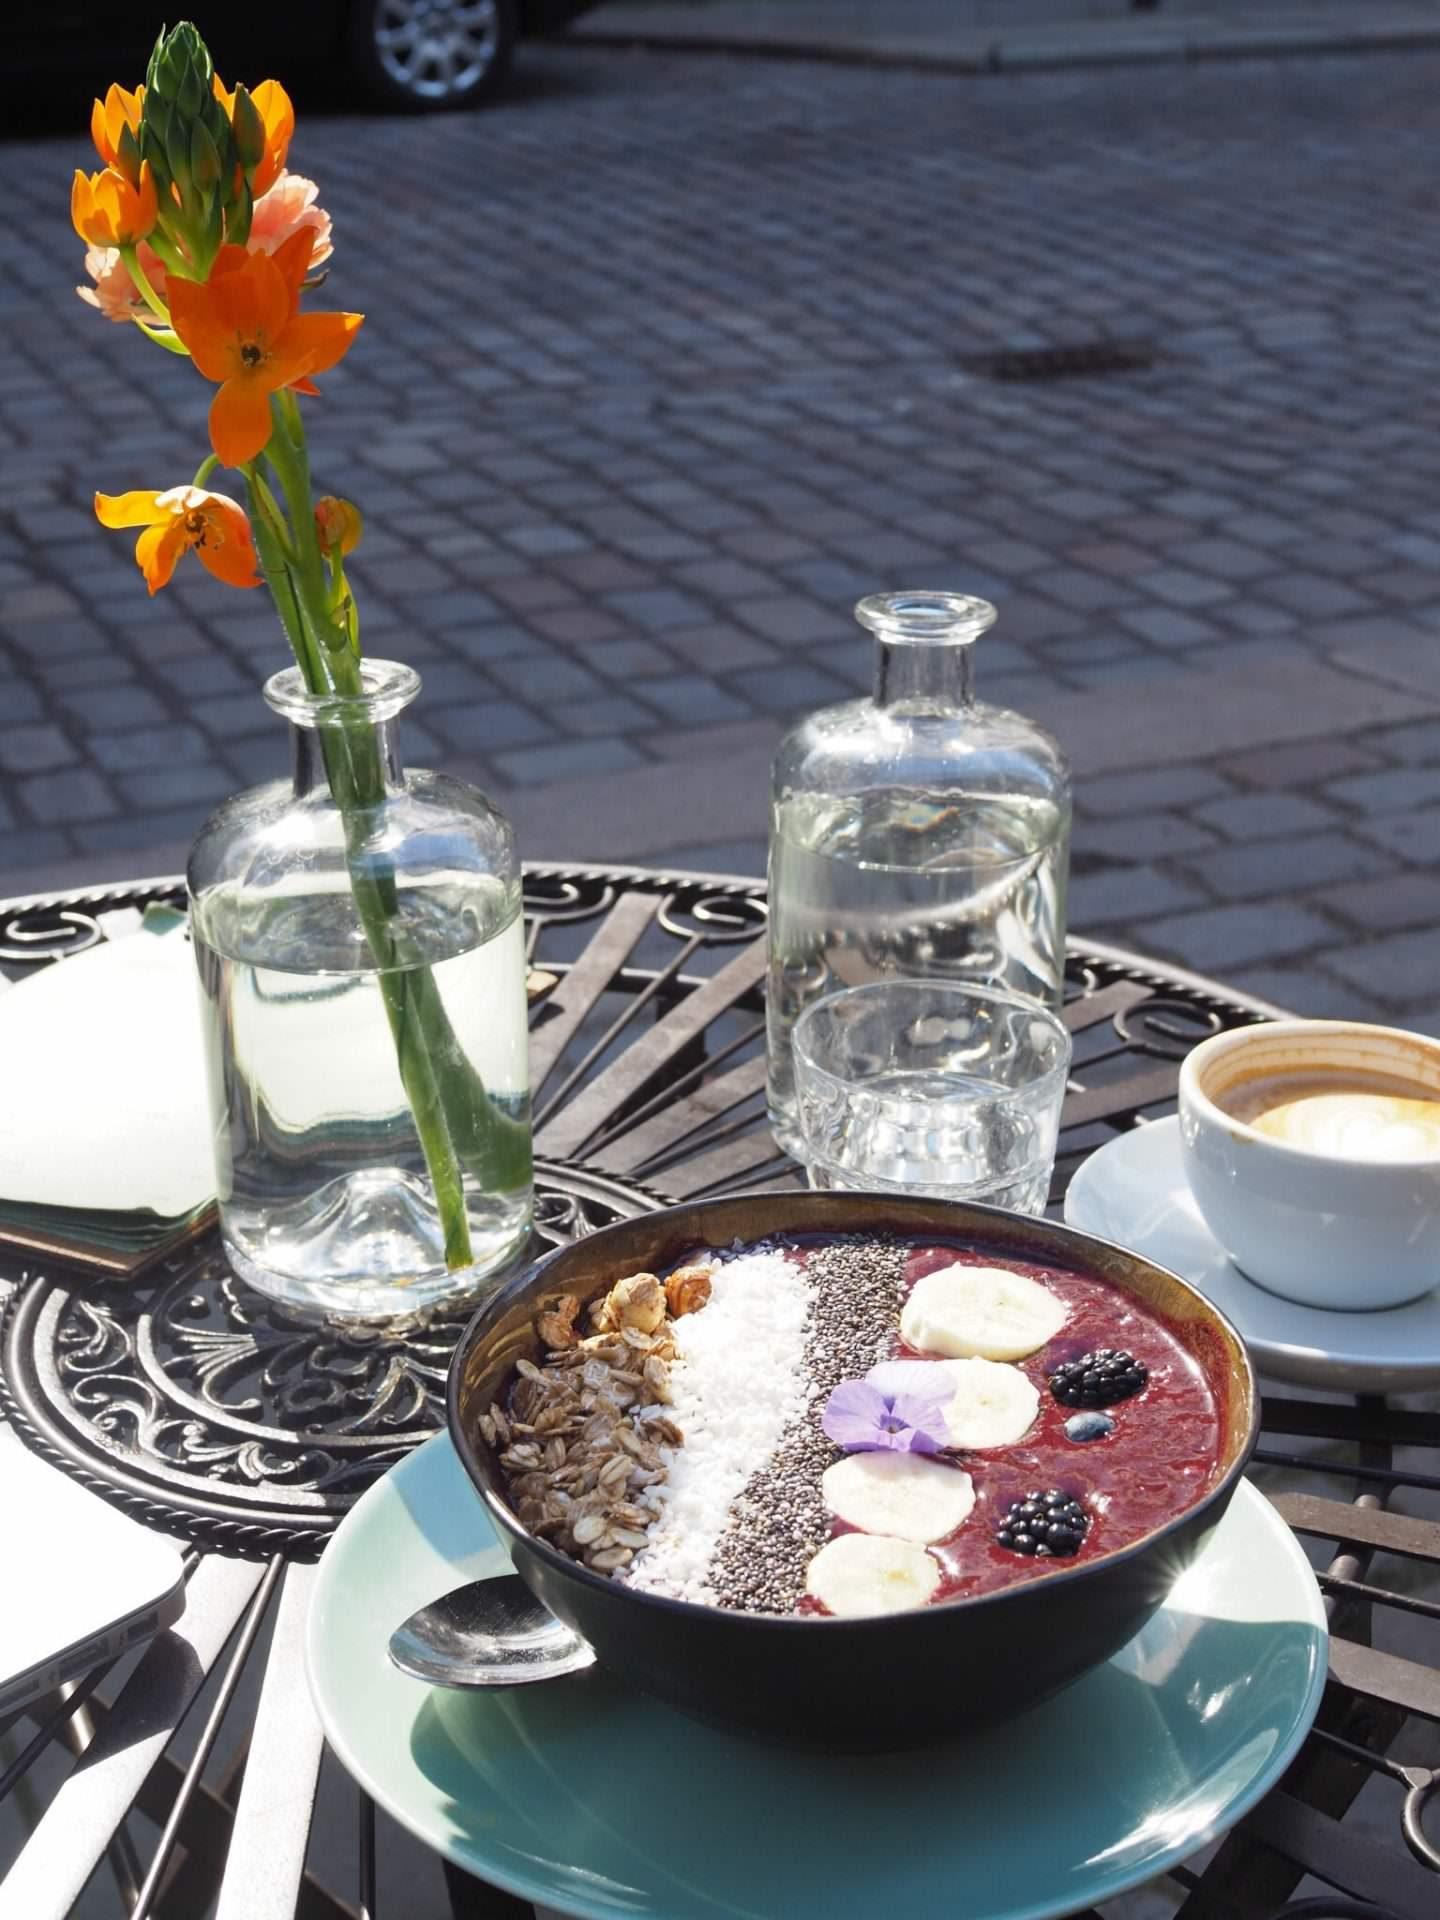 Hamburg-Restaurant-Café-Tipp-Speicherstadt-Nord-Coast-Coffee-Roastery-Acai-Bowl2